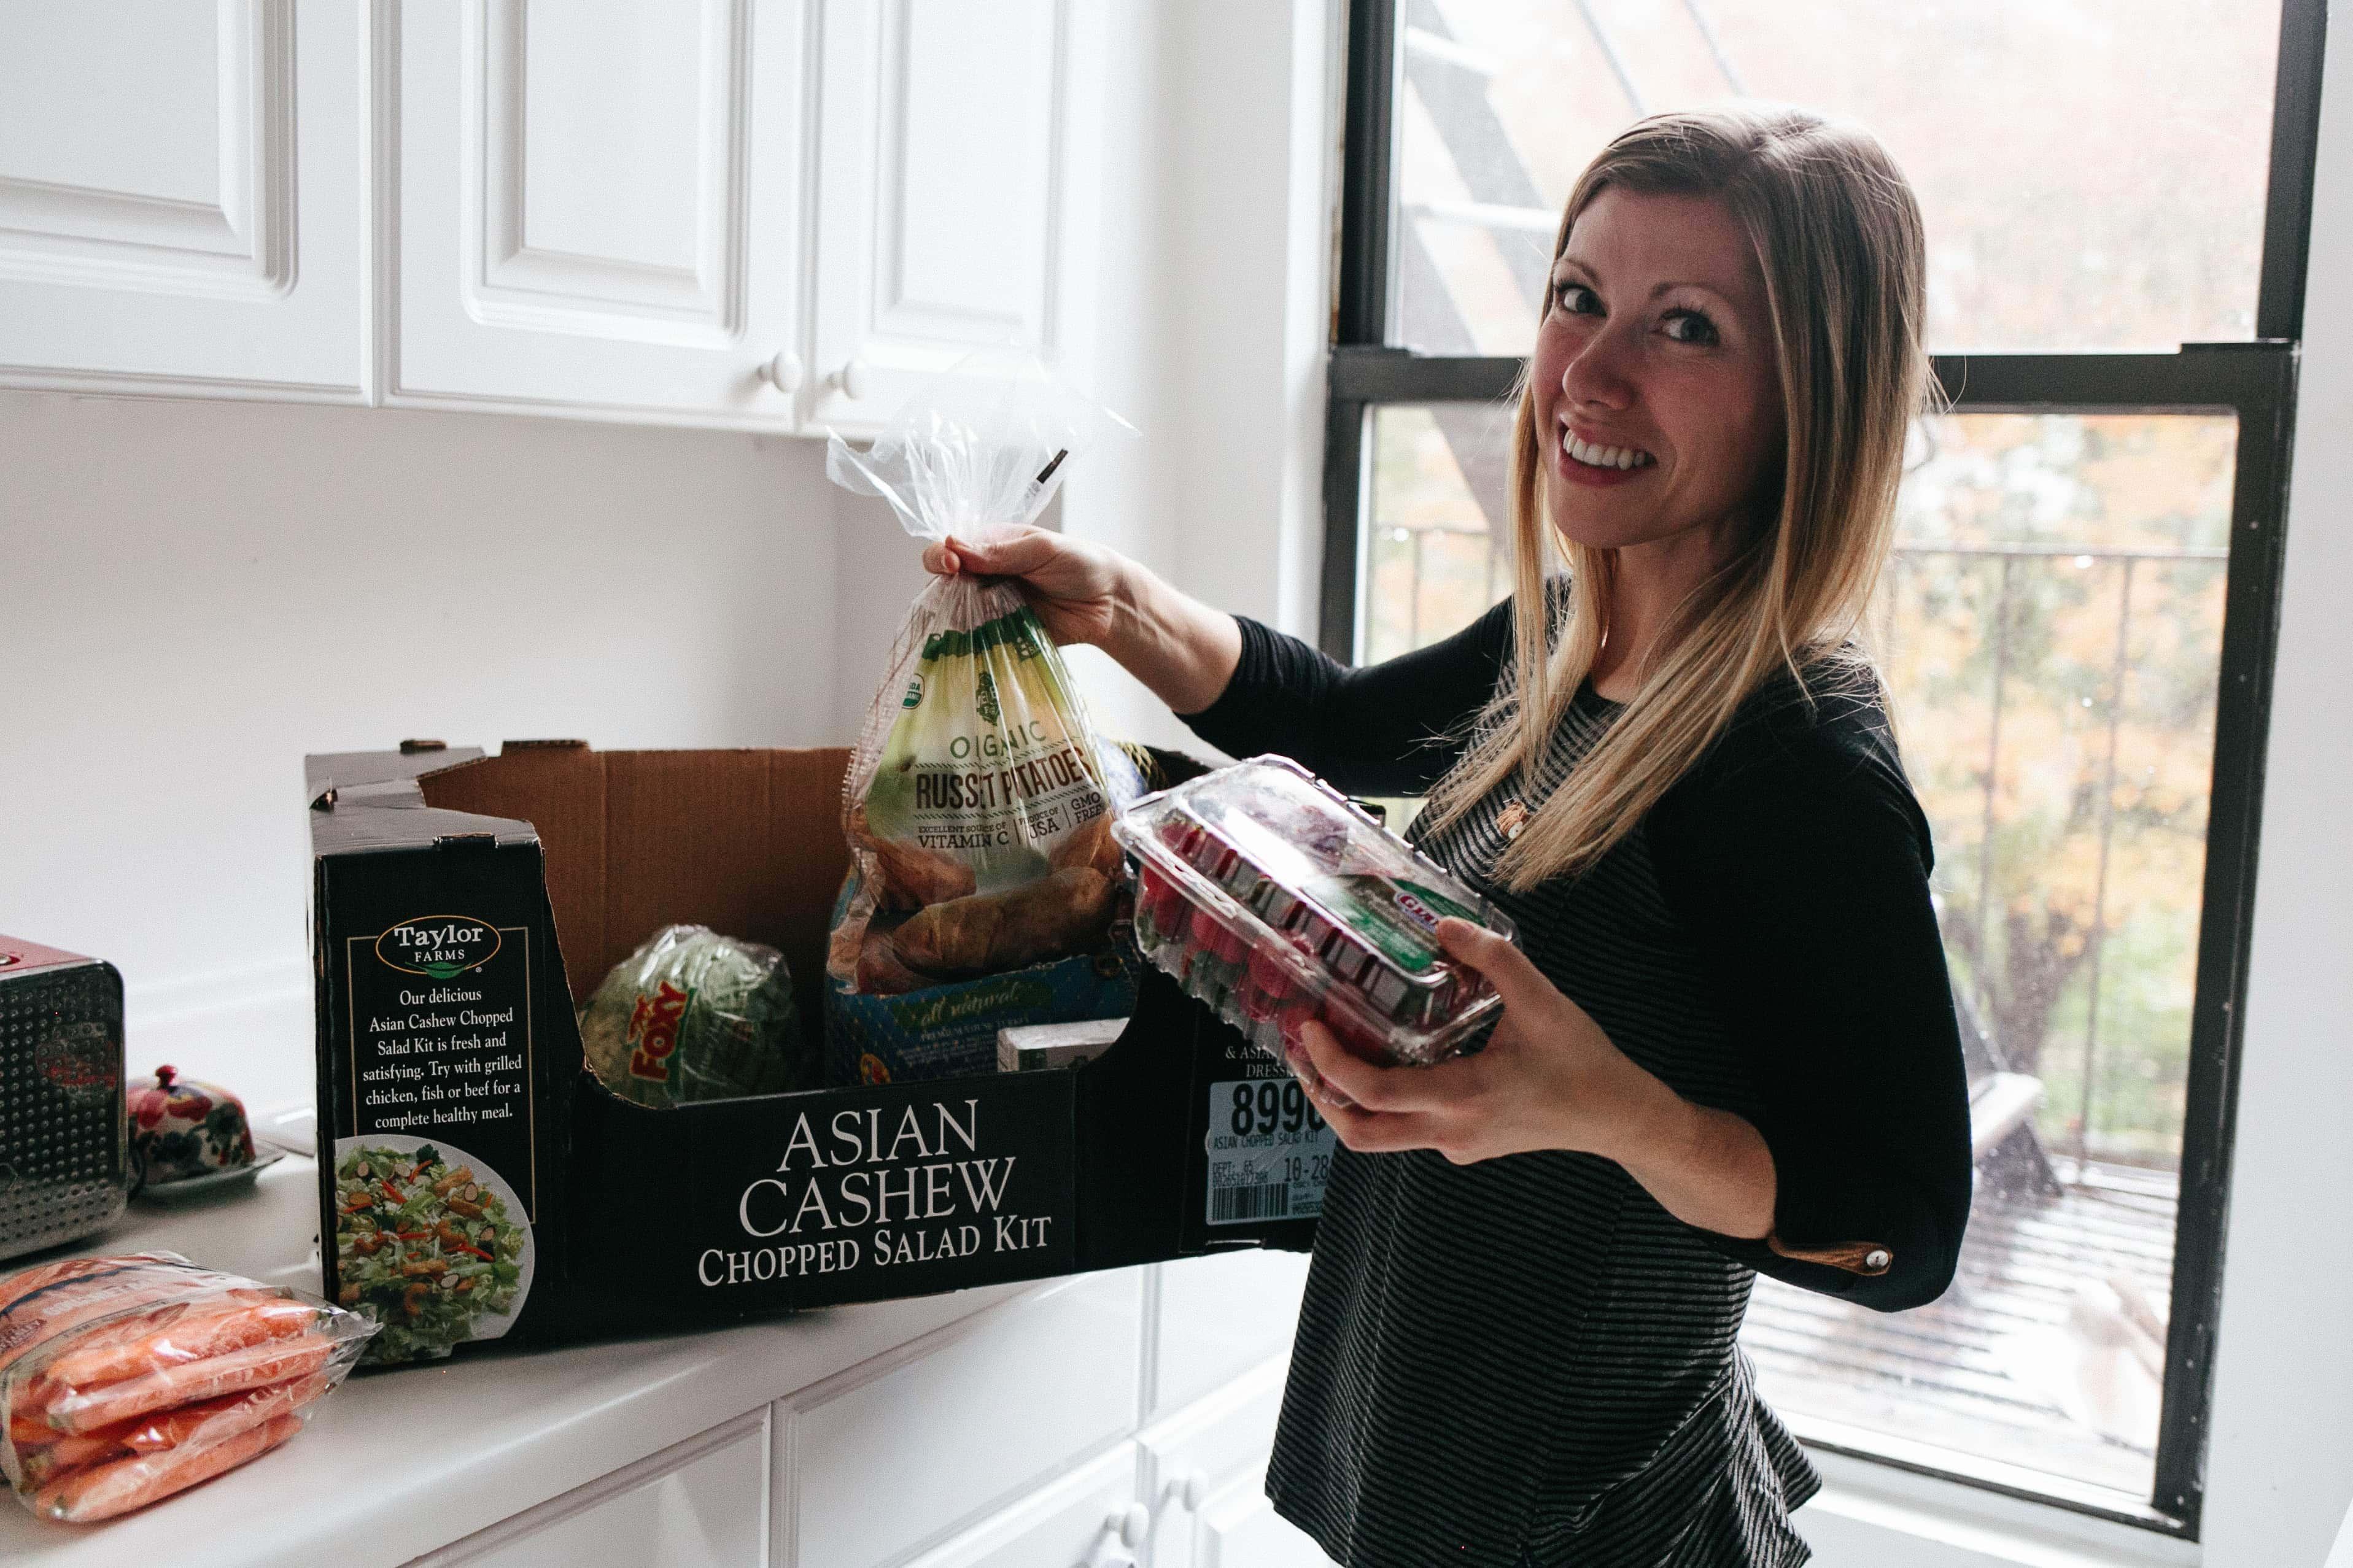 Lauren preparing groceries for Thanksgiving